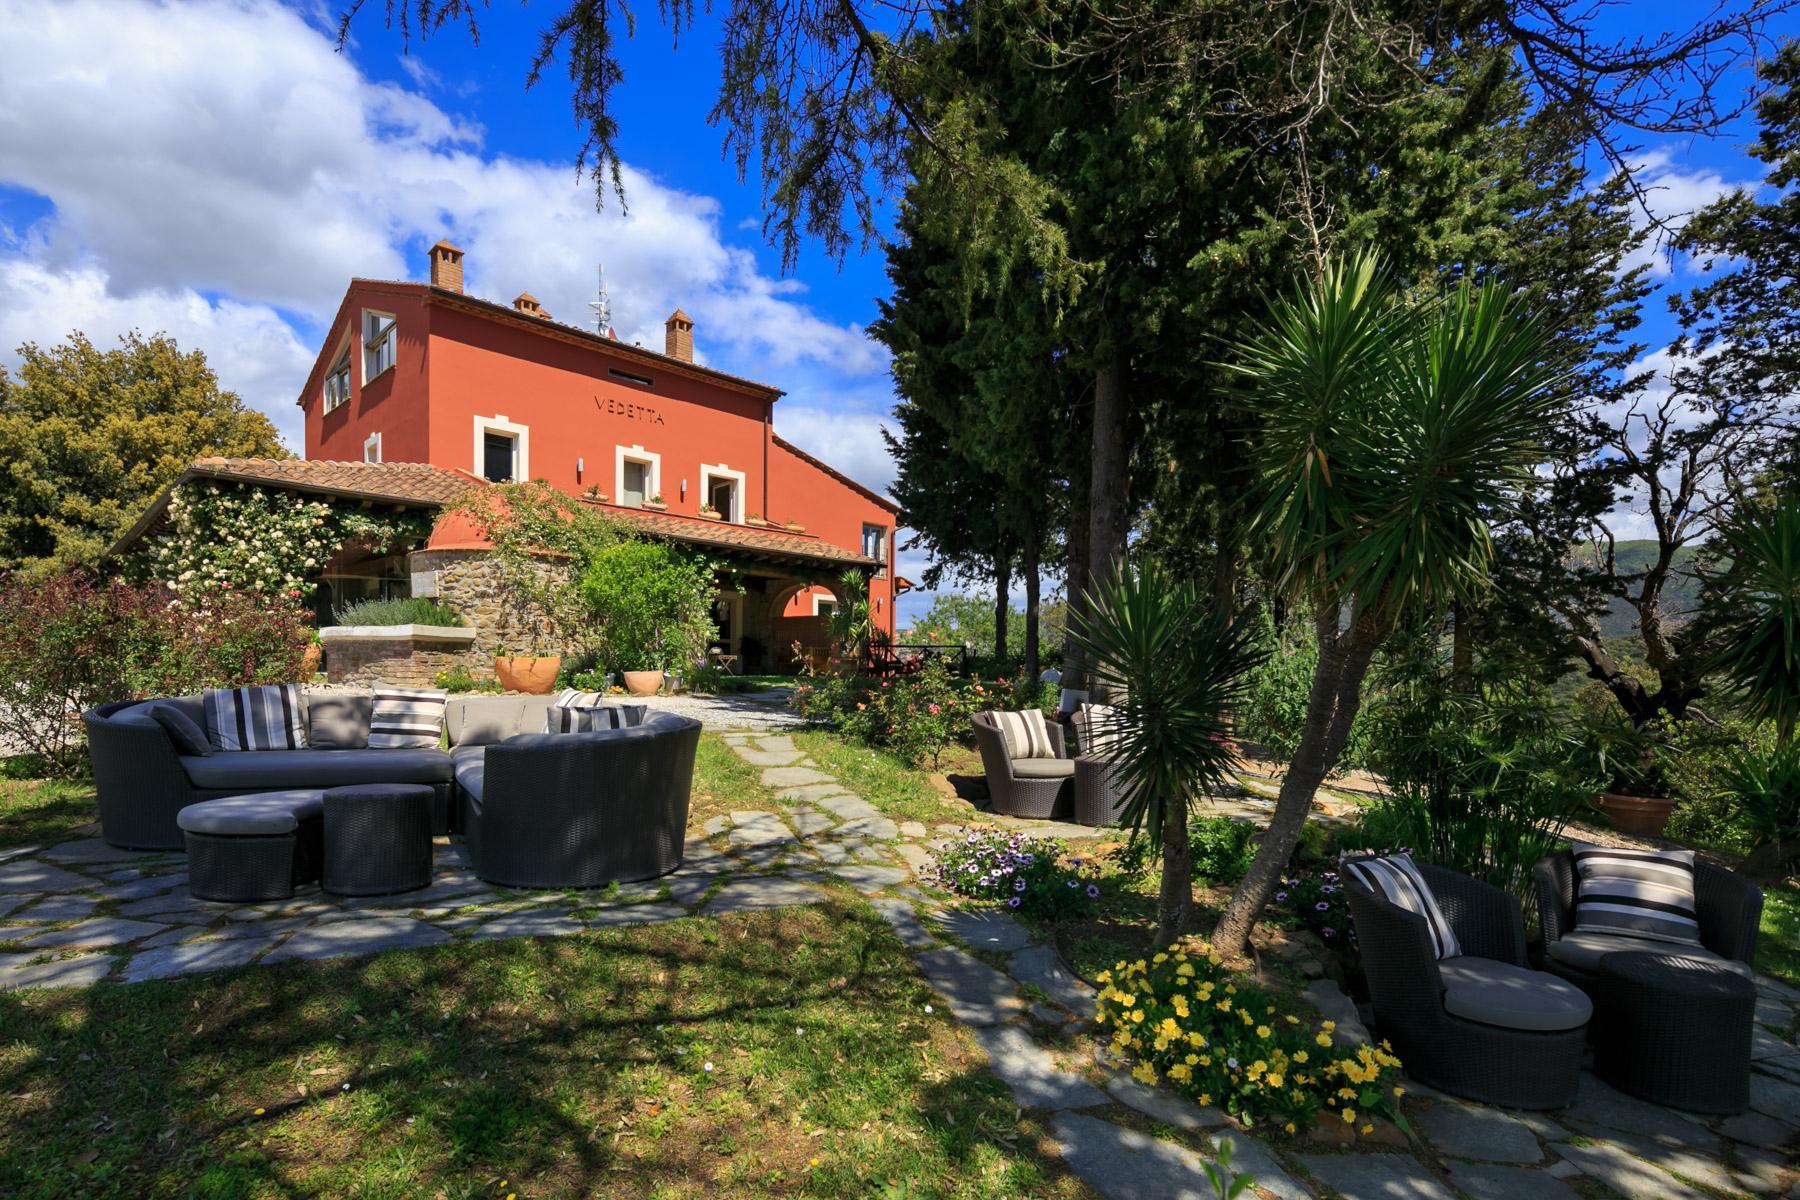 Villa historique avec vue imprenable sur le golfe de Scarlino - 1